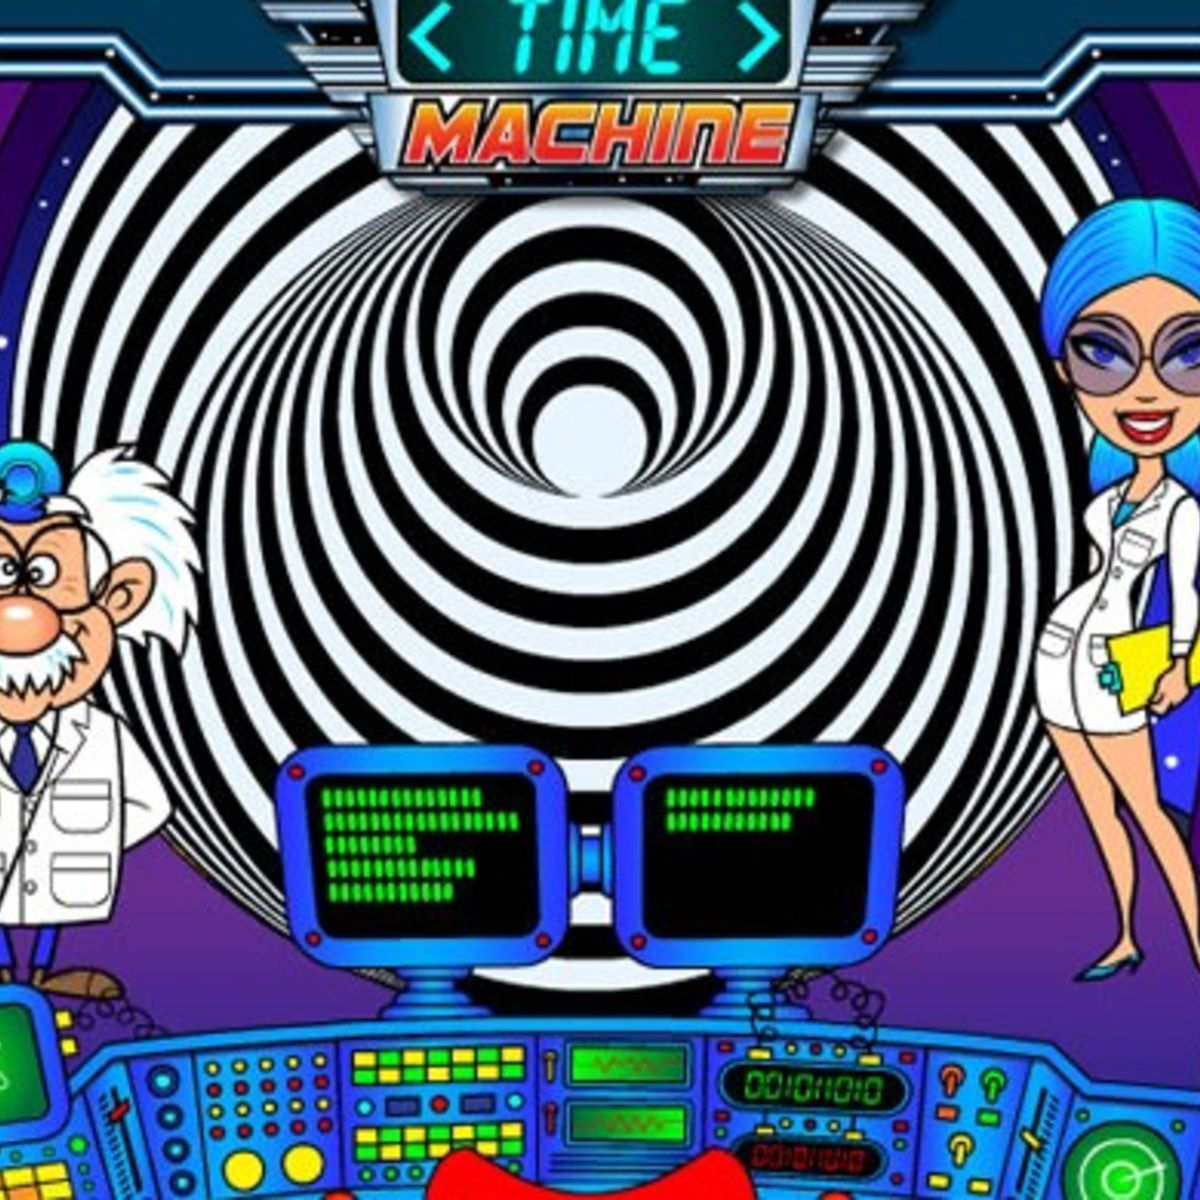 timemachine-850x390.jpg